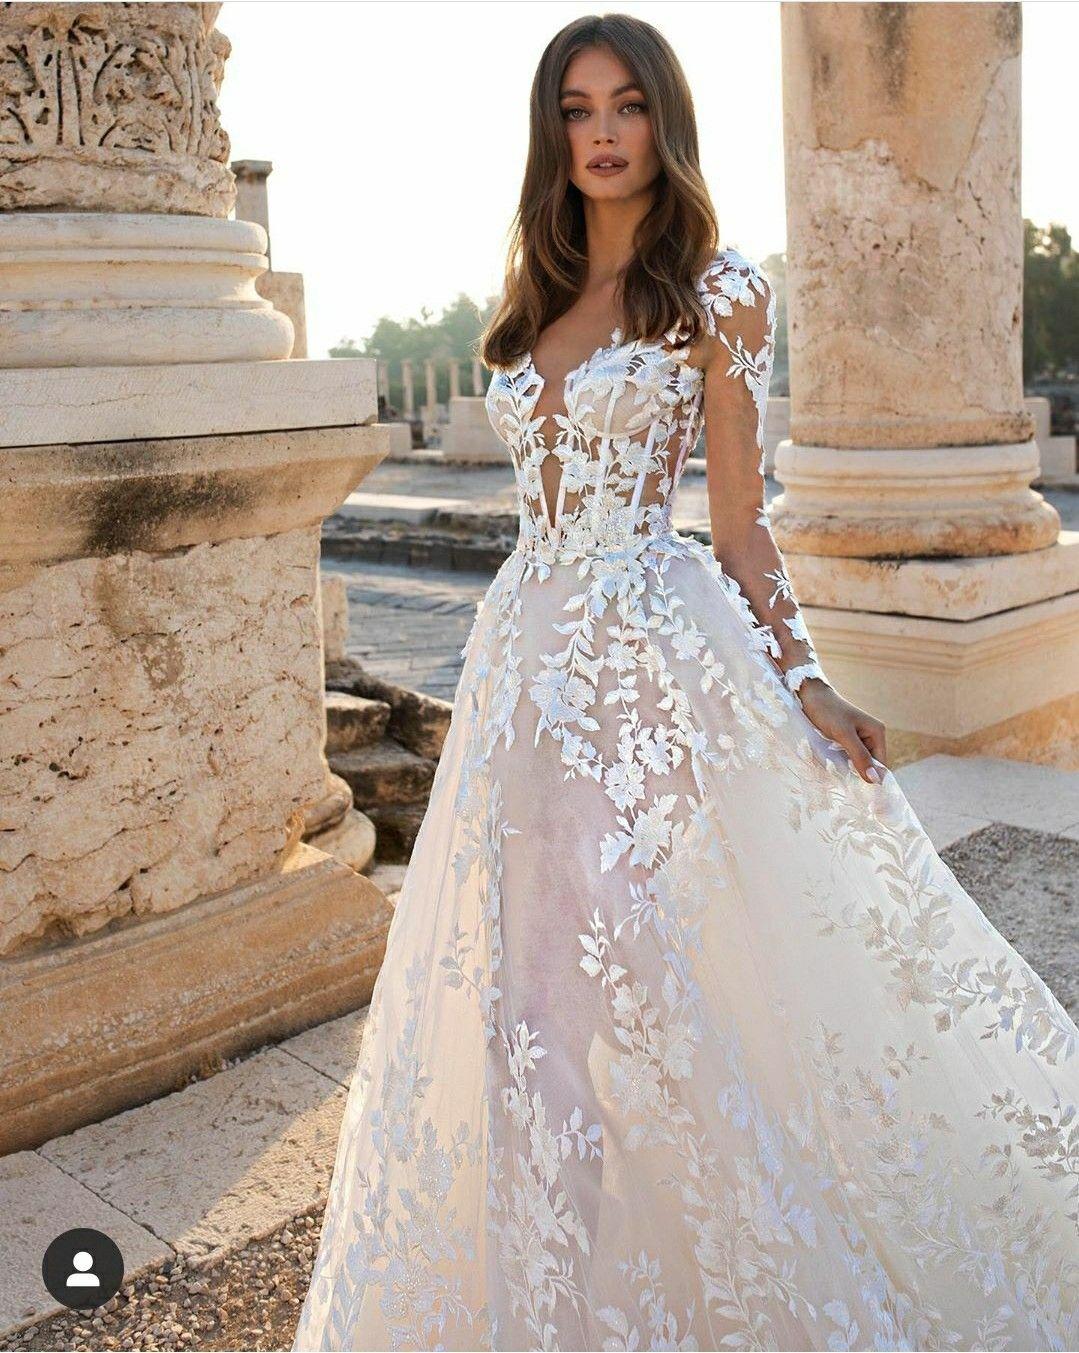 A Line Long Sleeve Floral Lace Wedding Dress With Plunging V Neckline Kleinfeld Bridal Pnina Tornai Wedding Dress Stylish Wedding Dresses Dream Wedding Dresses [ 1353 x 1079 Pixel ]